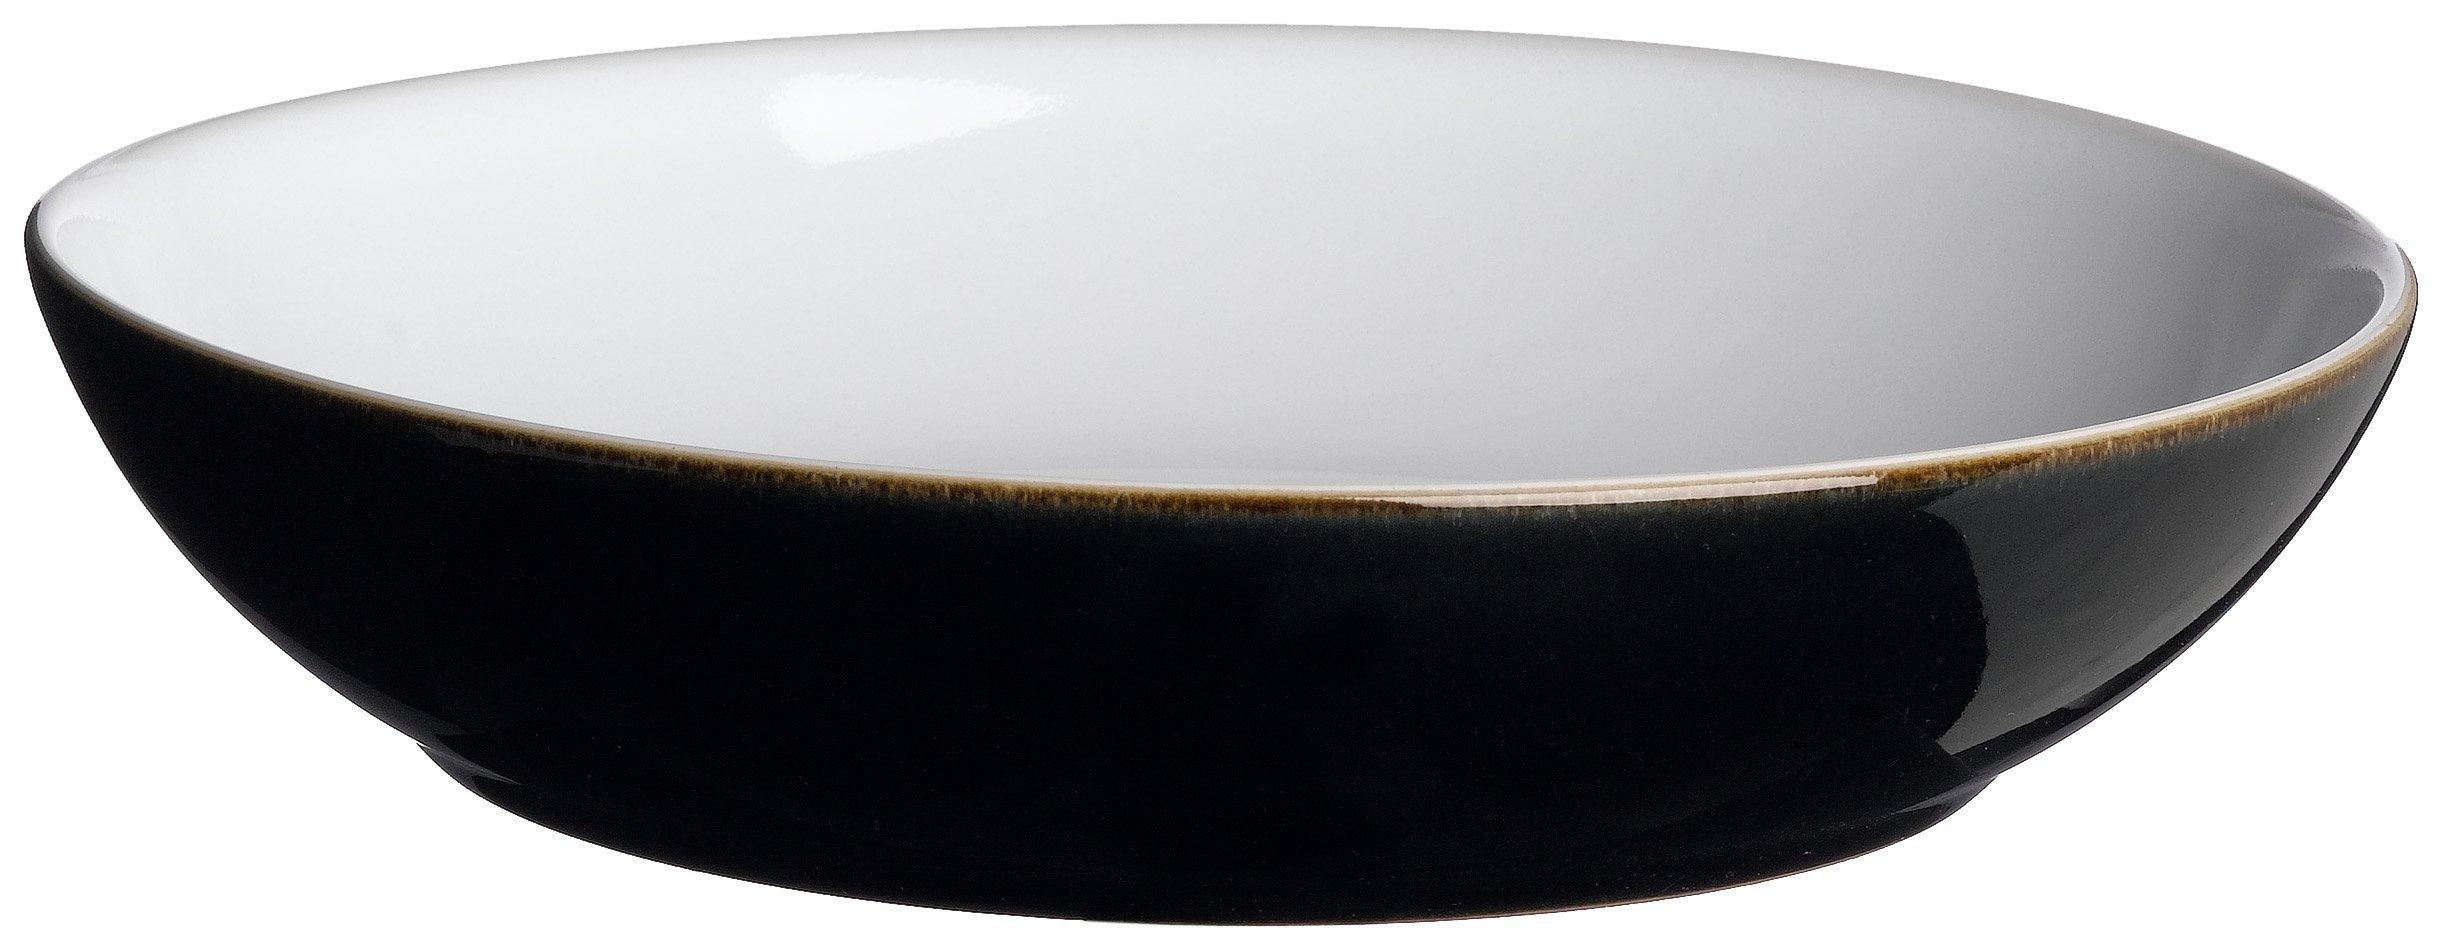 Denby Jet Black Individual Pasta Bowl